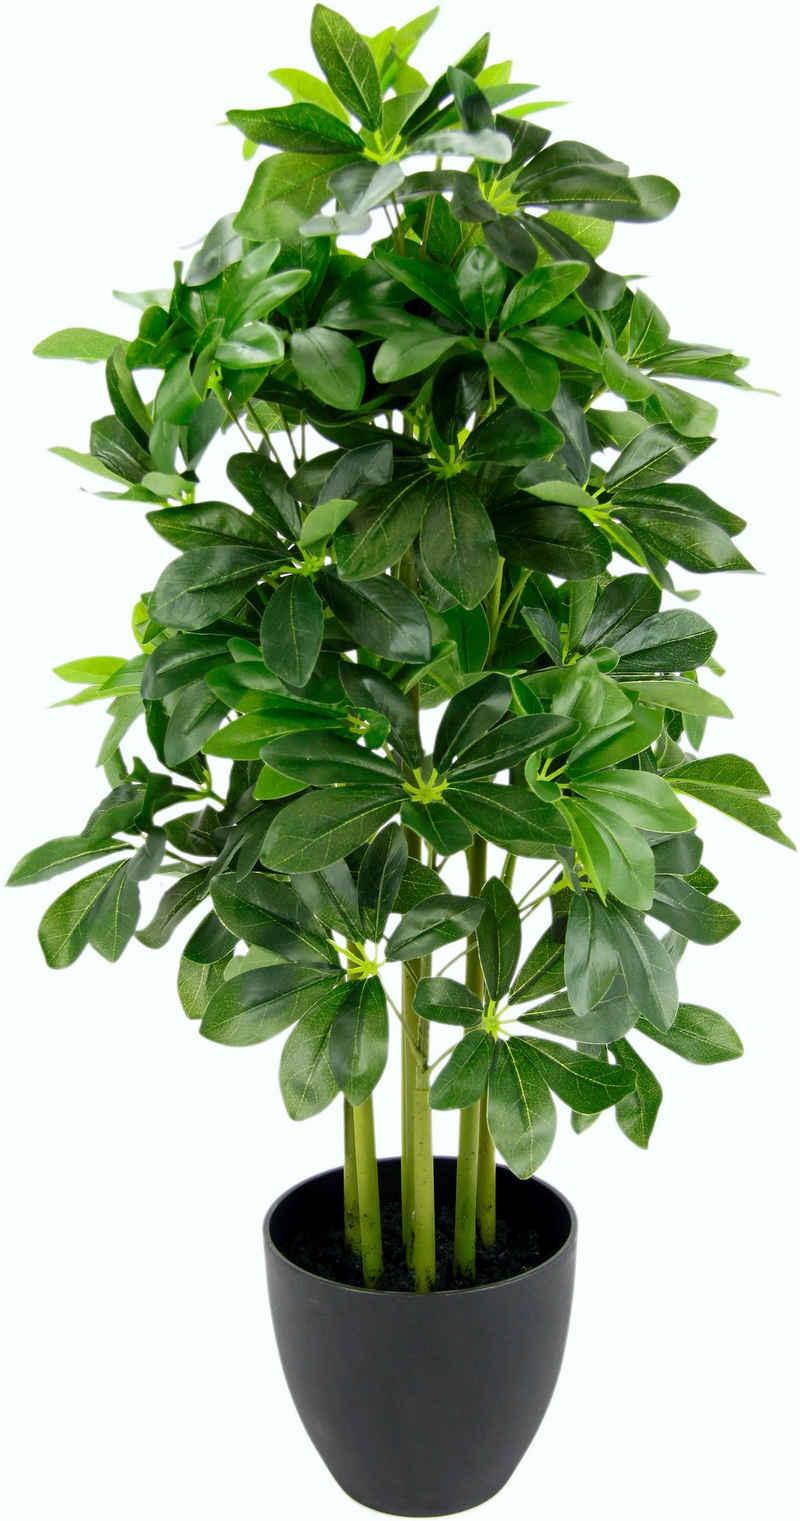 Kunstpflanze »Schefflerapflanze«, I.GE.A., Höhe 83 cm, im Kunststofftopf